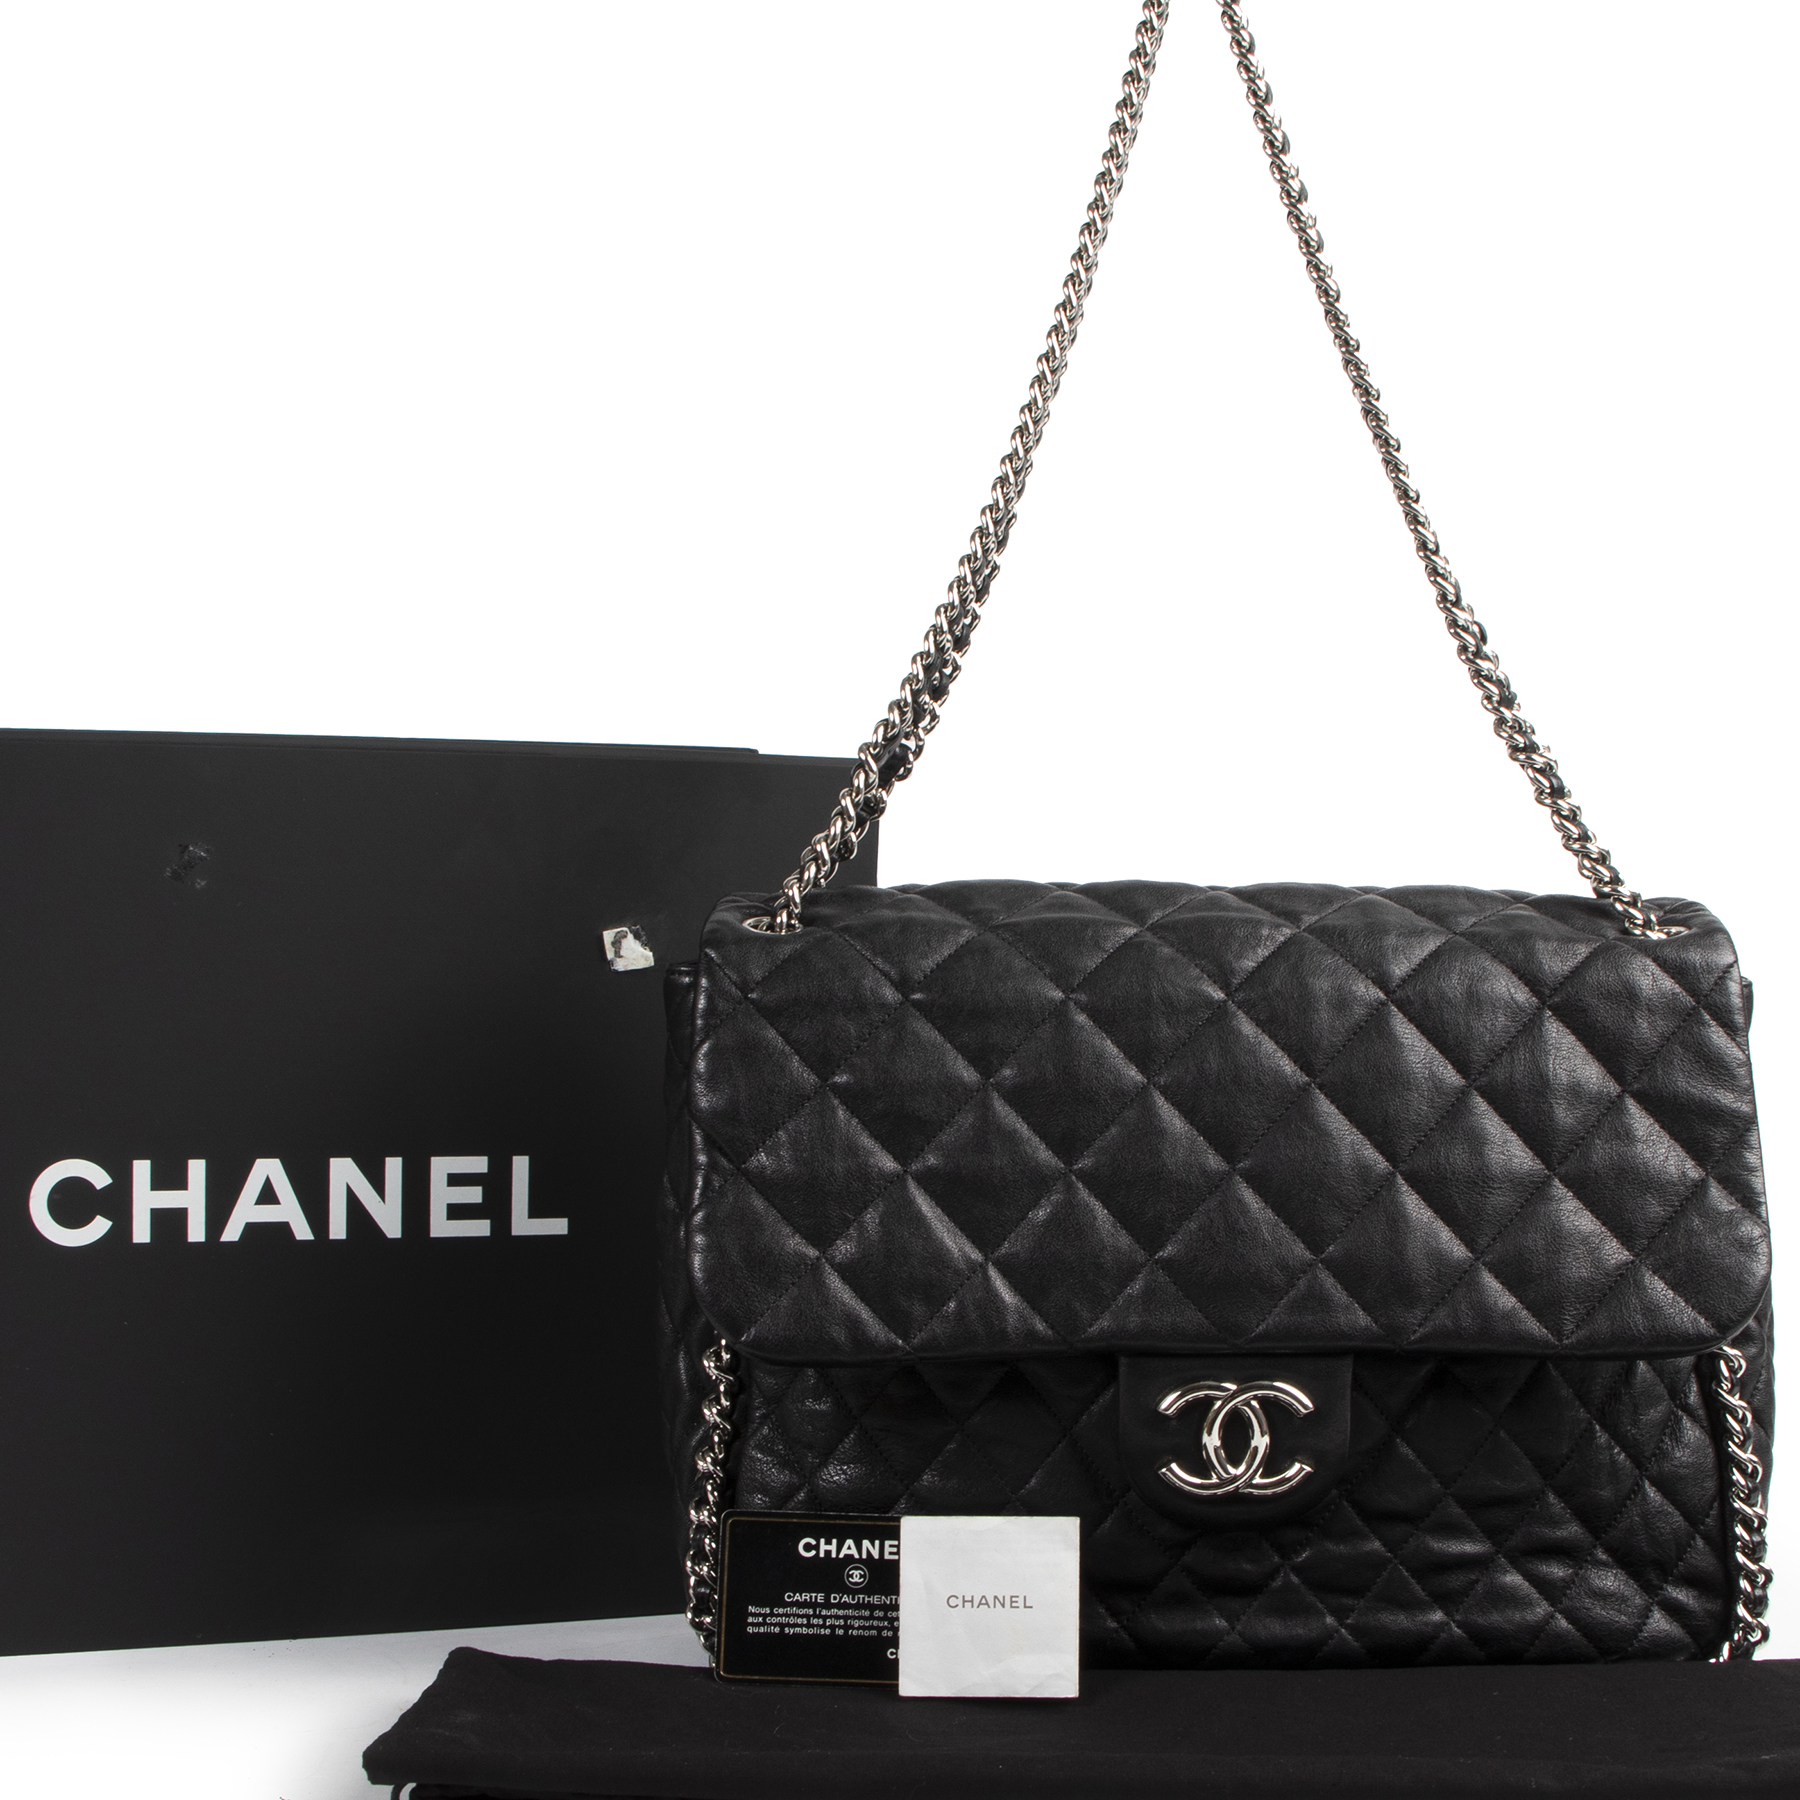 Authentic secondhand Chanel Black Quilted Leather Shoulder Bag designer bags fashion luxury vintage webshop safe secure online shopping